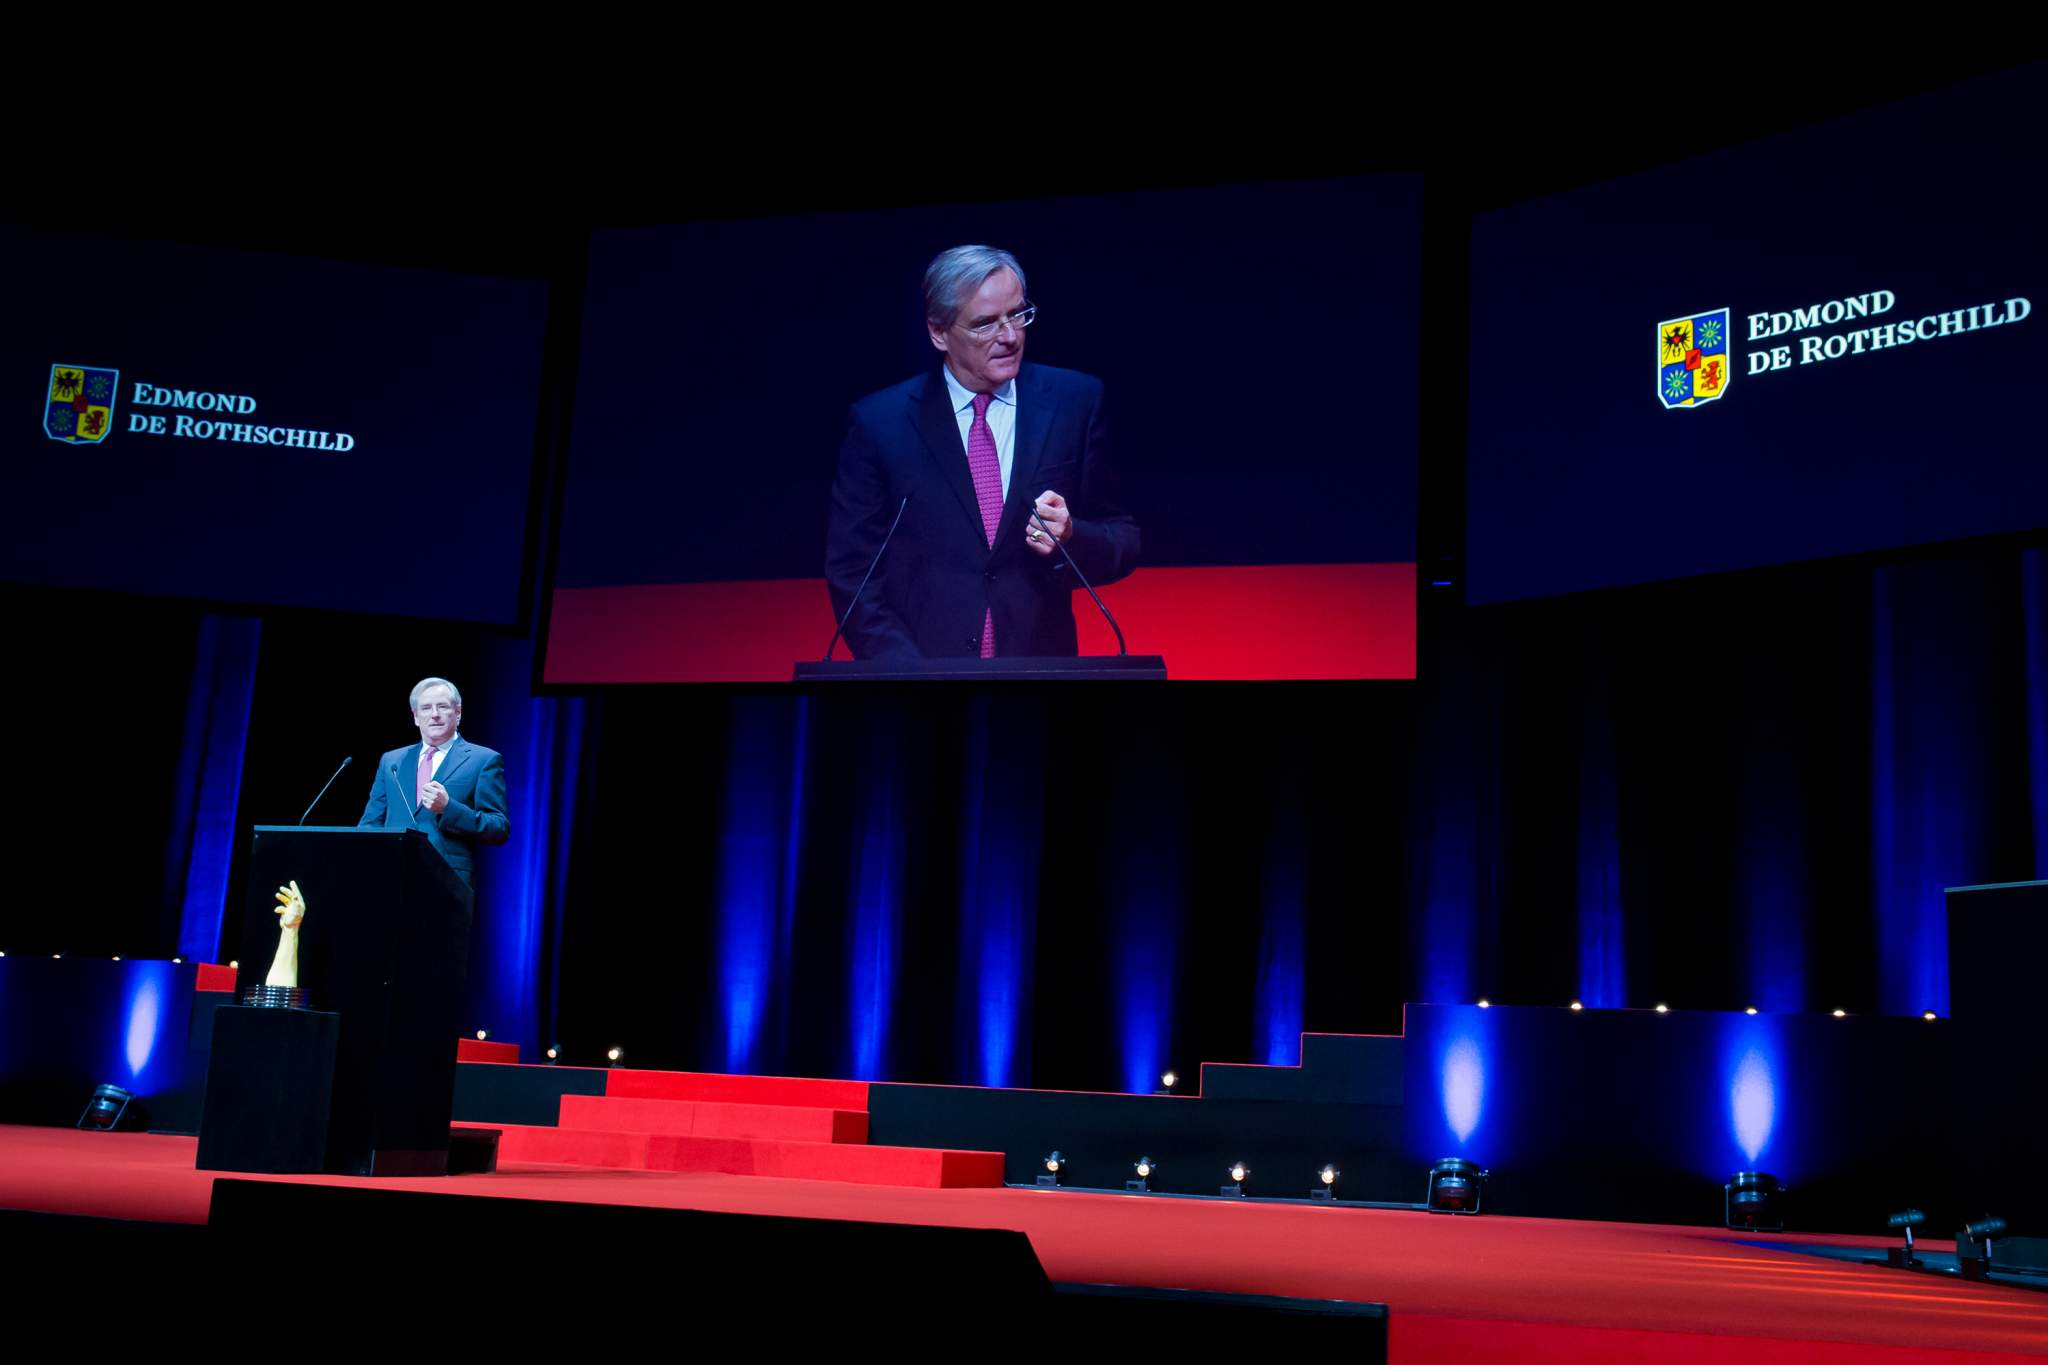 Hervé de Montlivault, Directeur général adjoint, Banque Privée Edmond de Rothschild